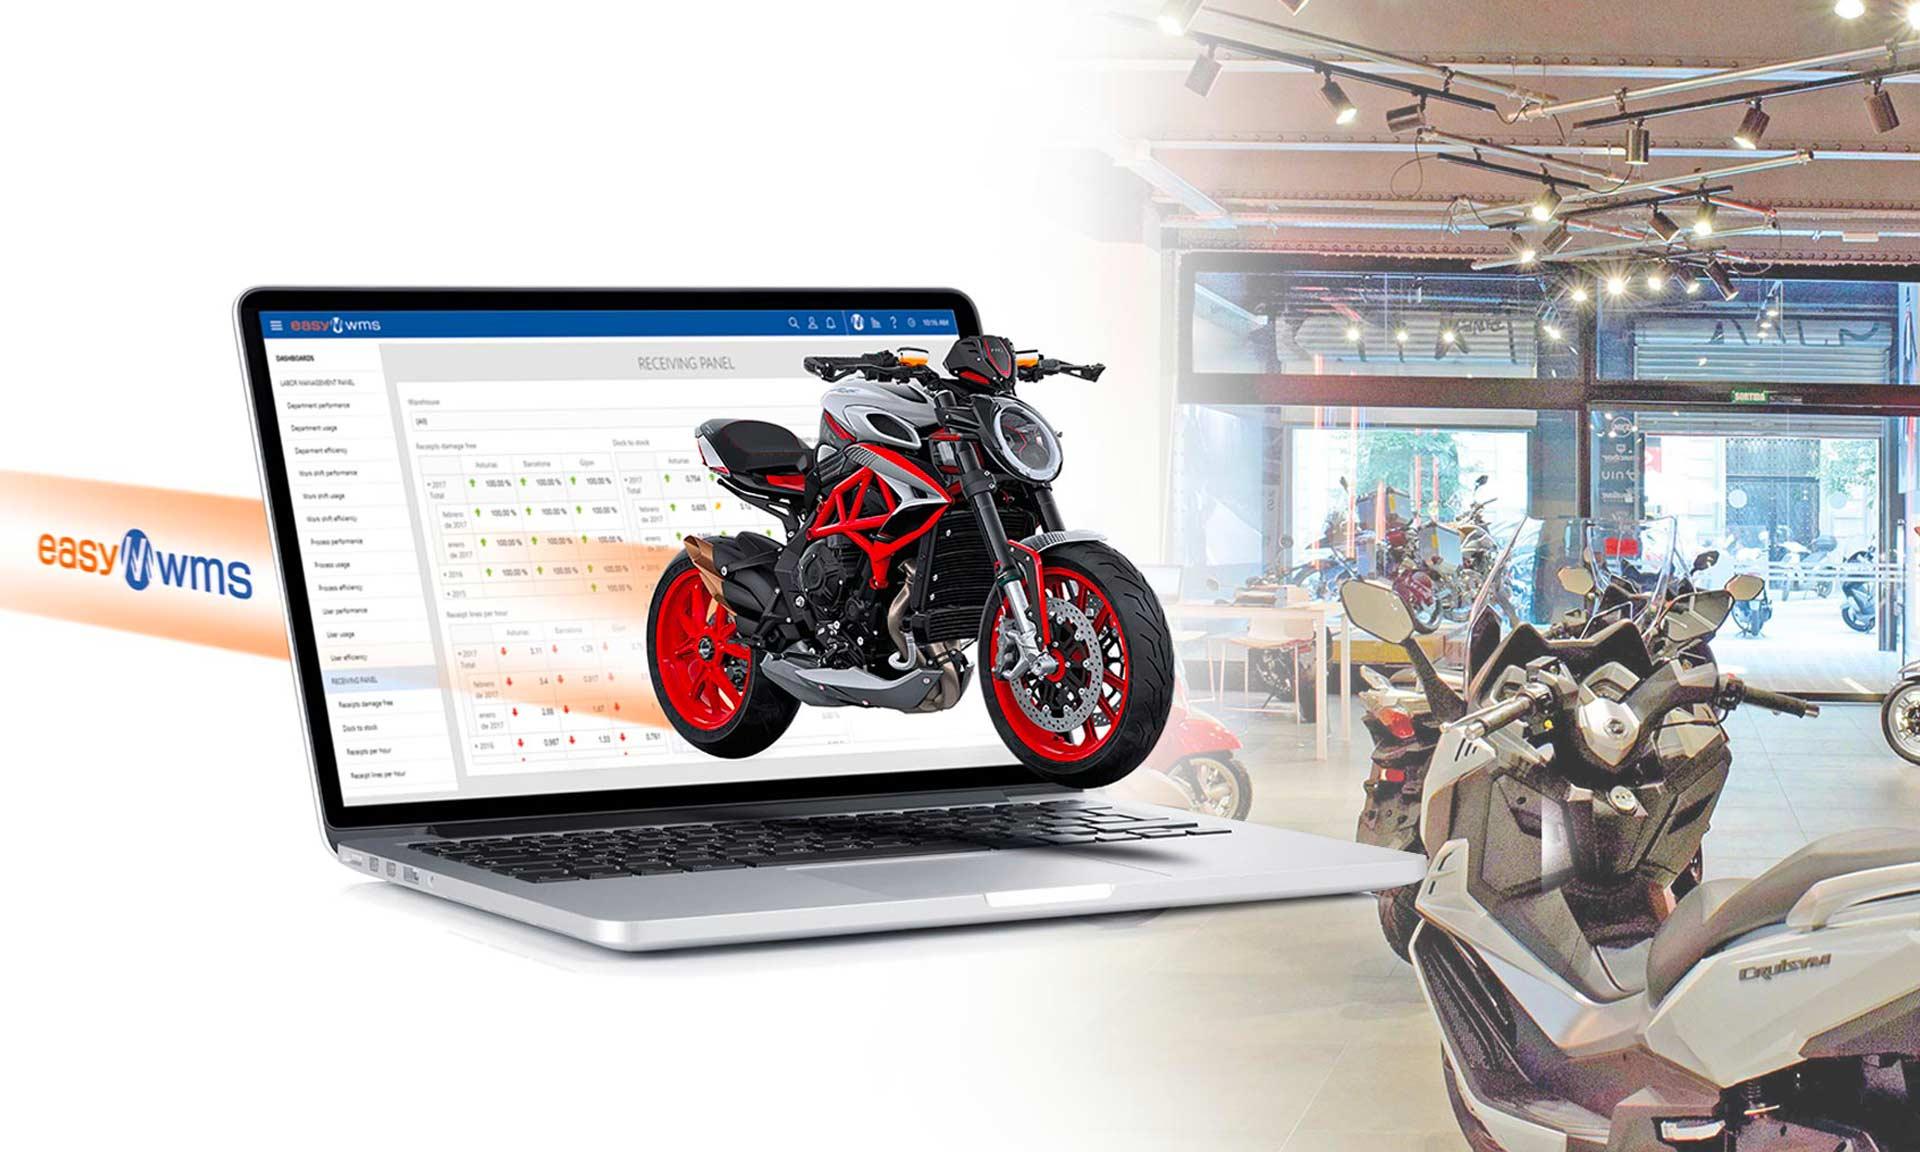 Motos Bordoy: logistics at full throttle